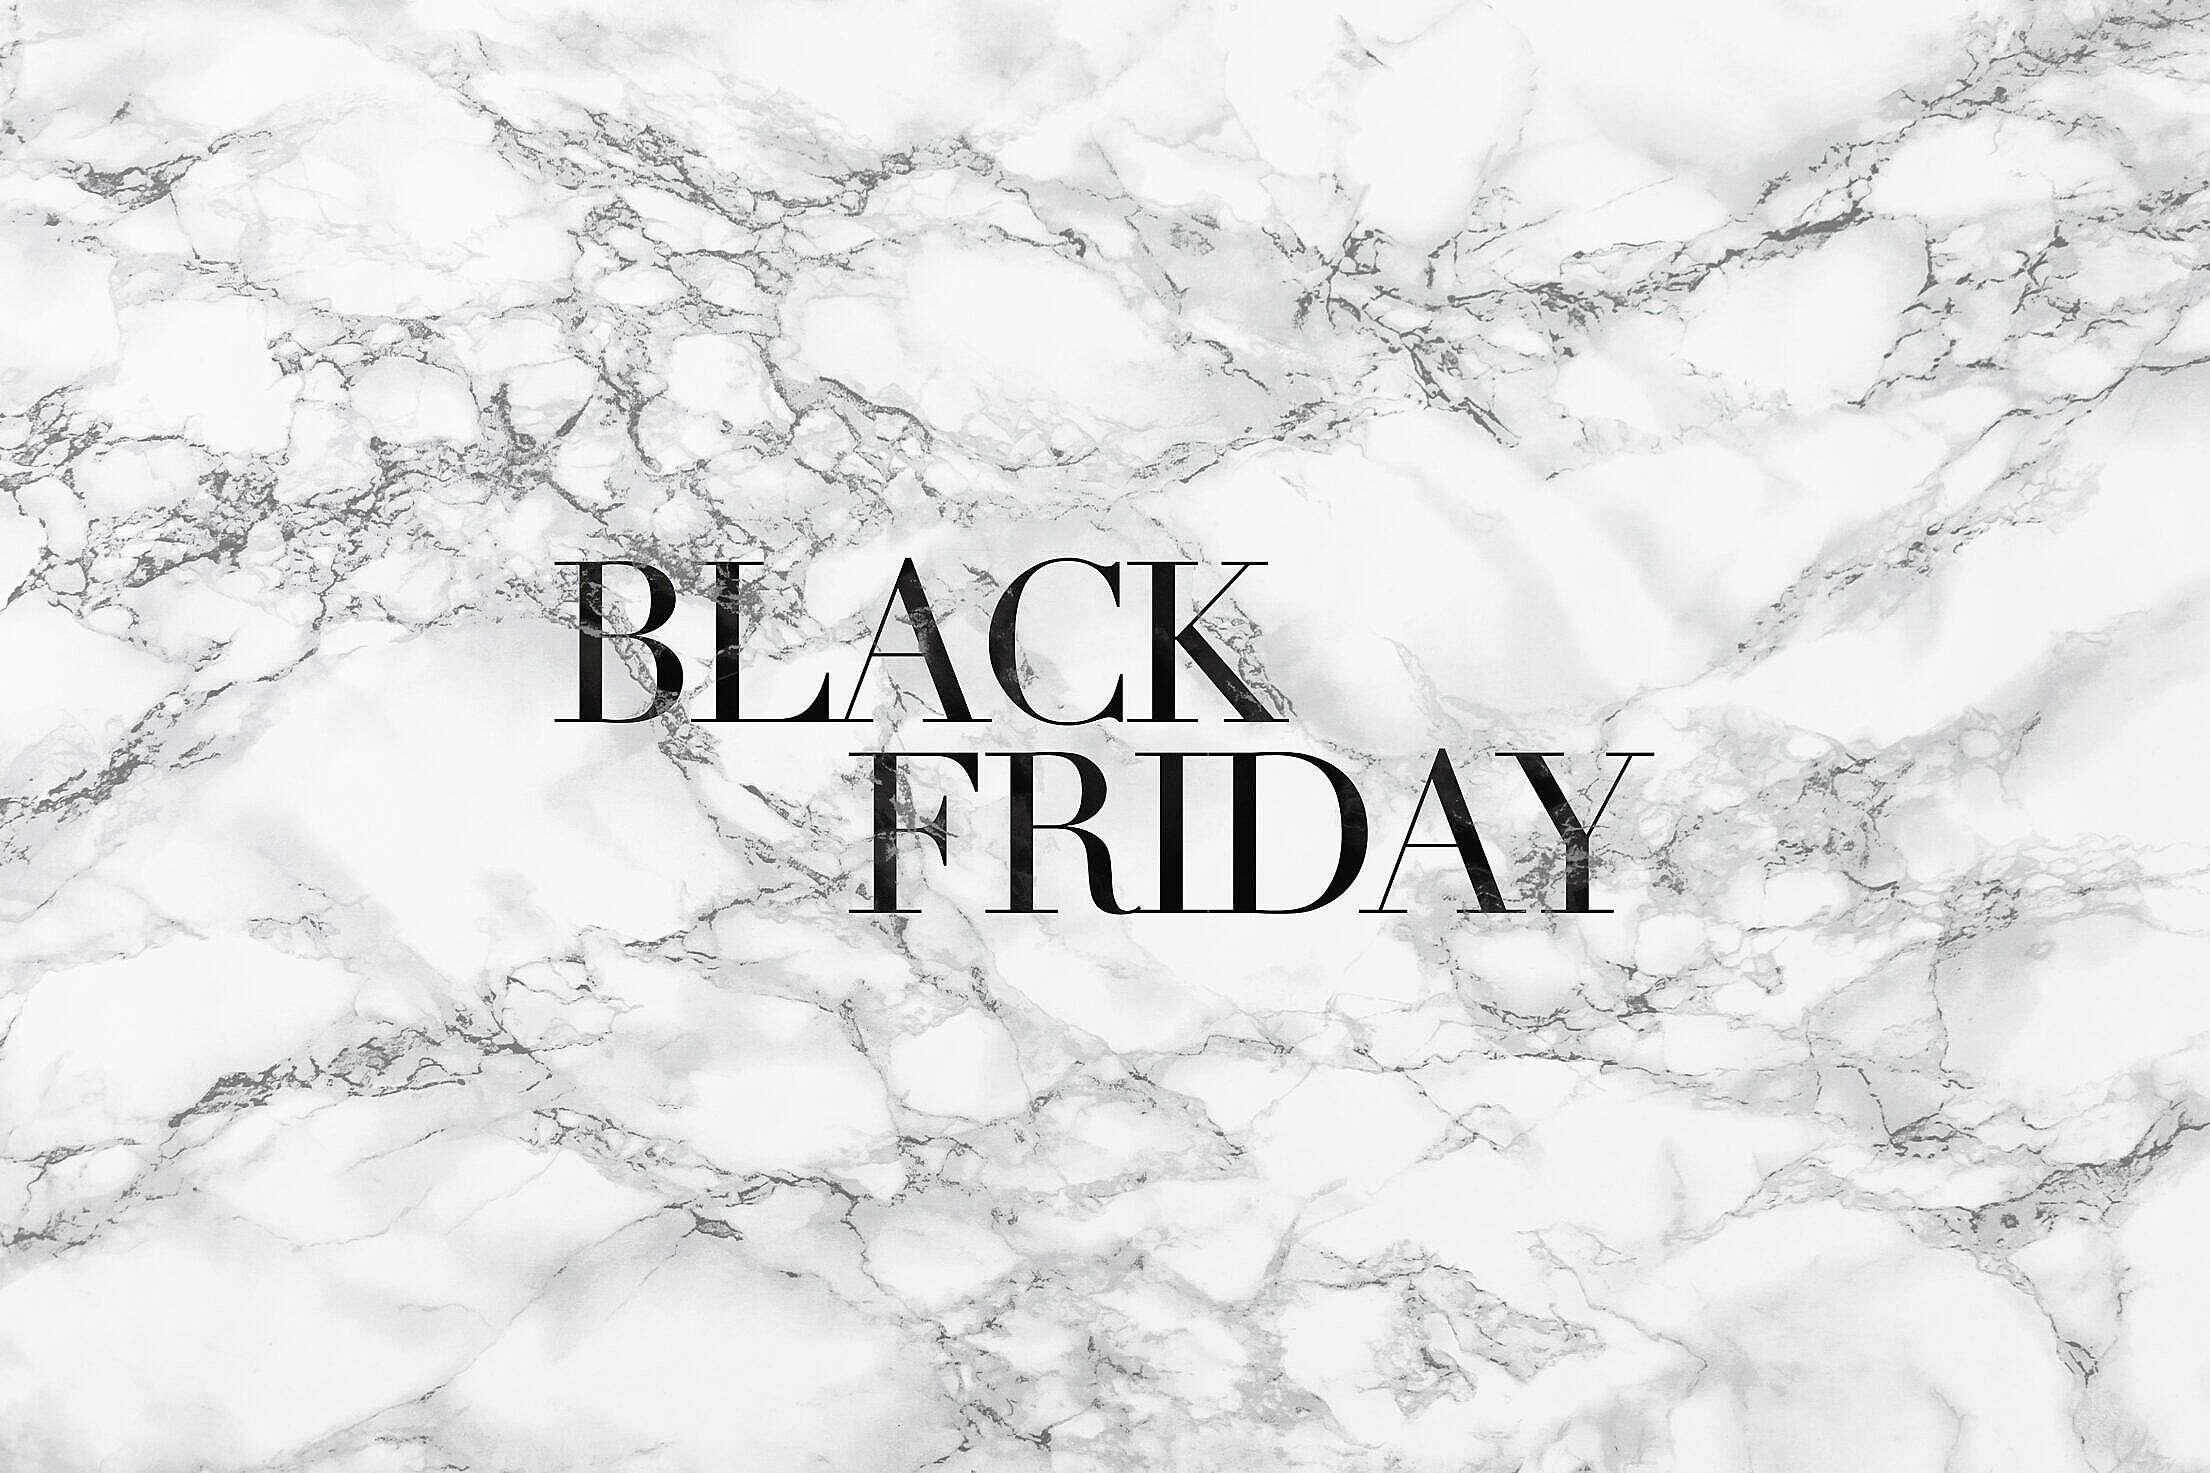 Black Friday Luxury Lettering on White Marble Free Stock Photo